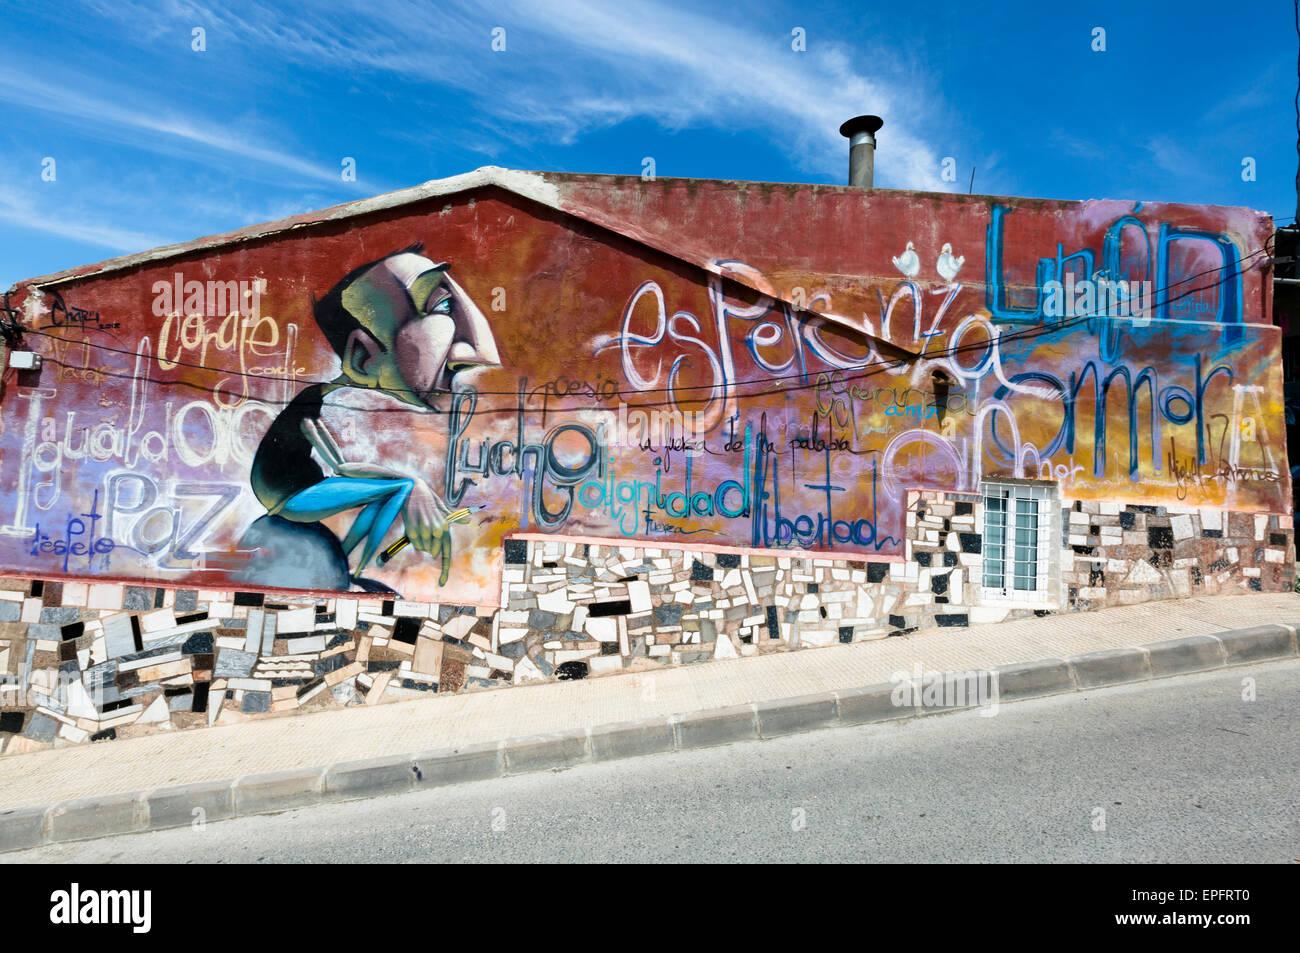 Murals, San Isidro, Orihuela, Spain - Stock Image